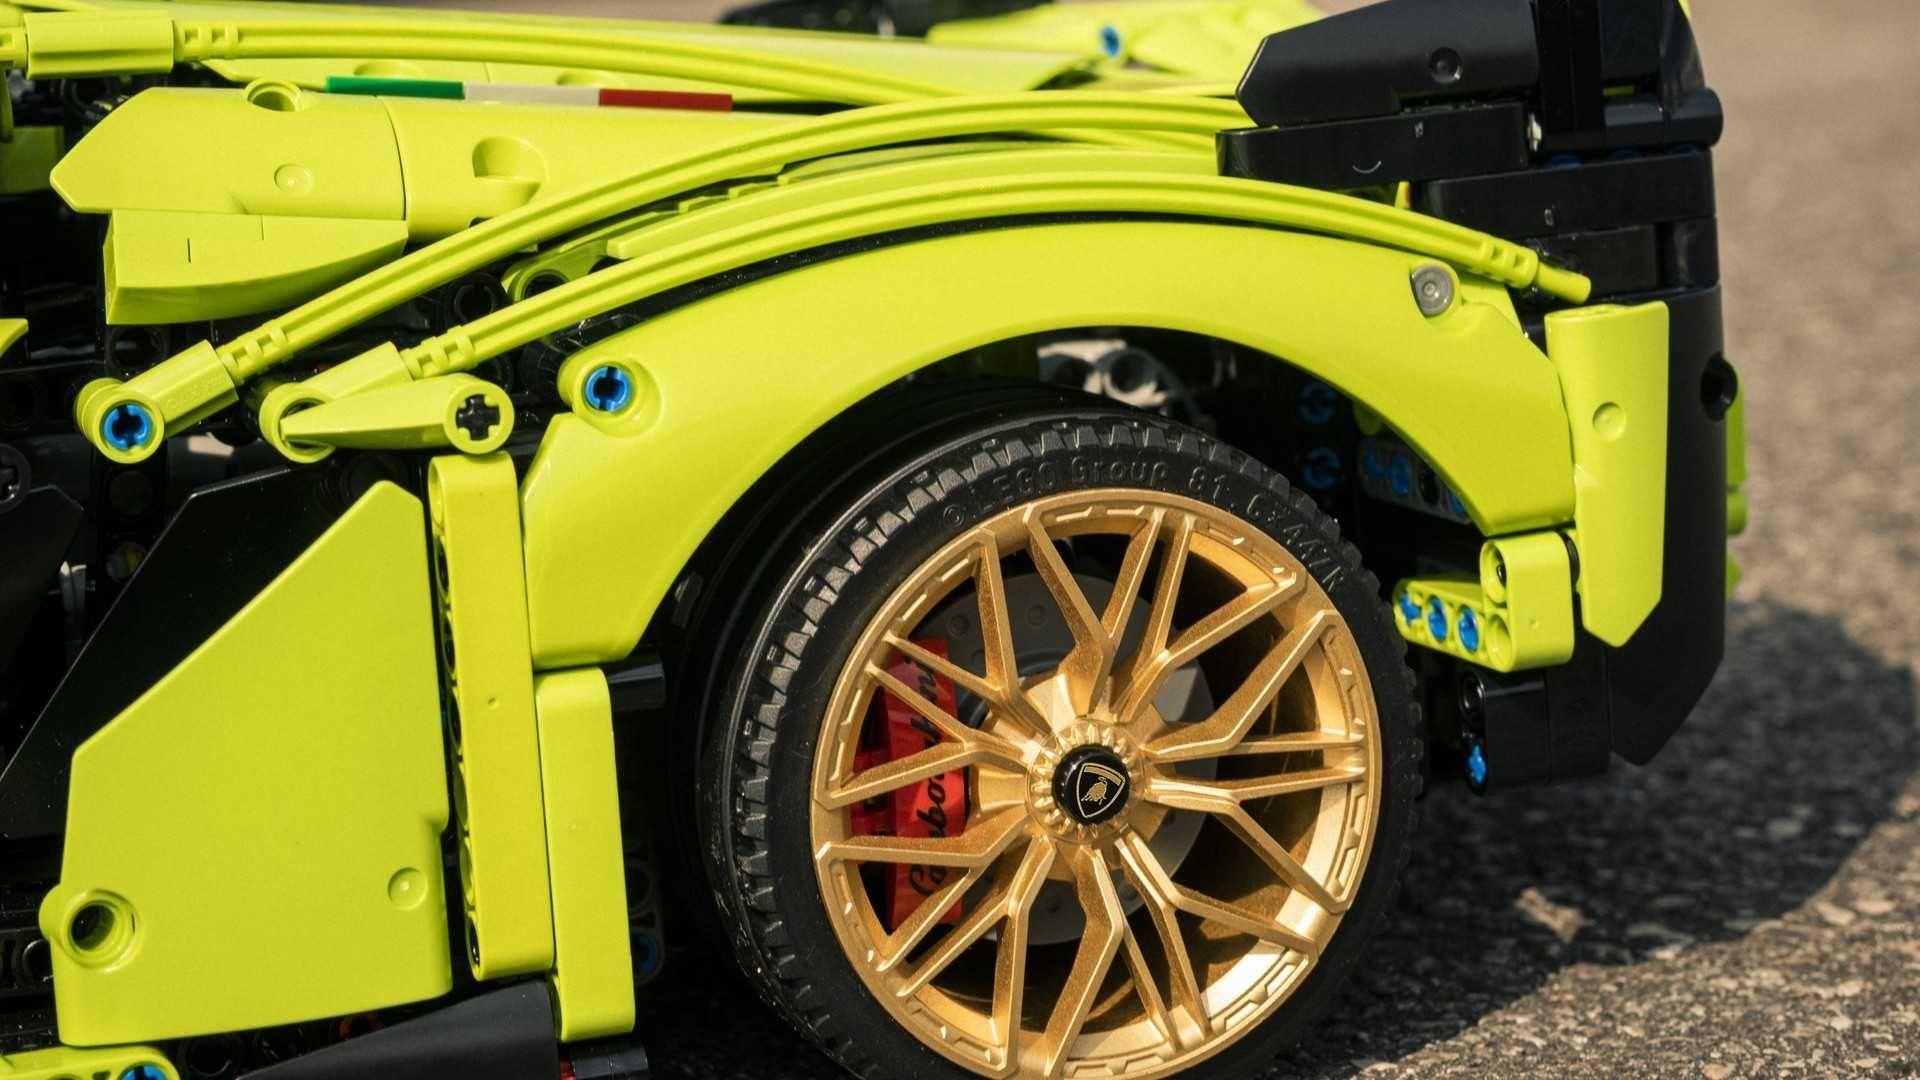 Lamborghini-Sian-FKP-37-Lego-Technic-15